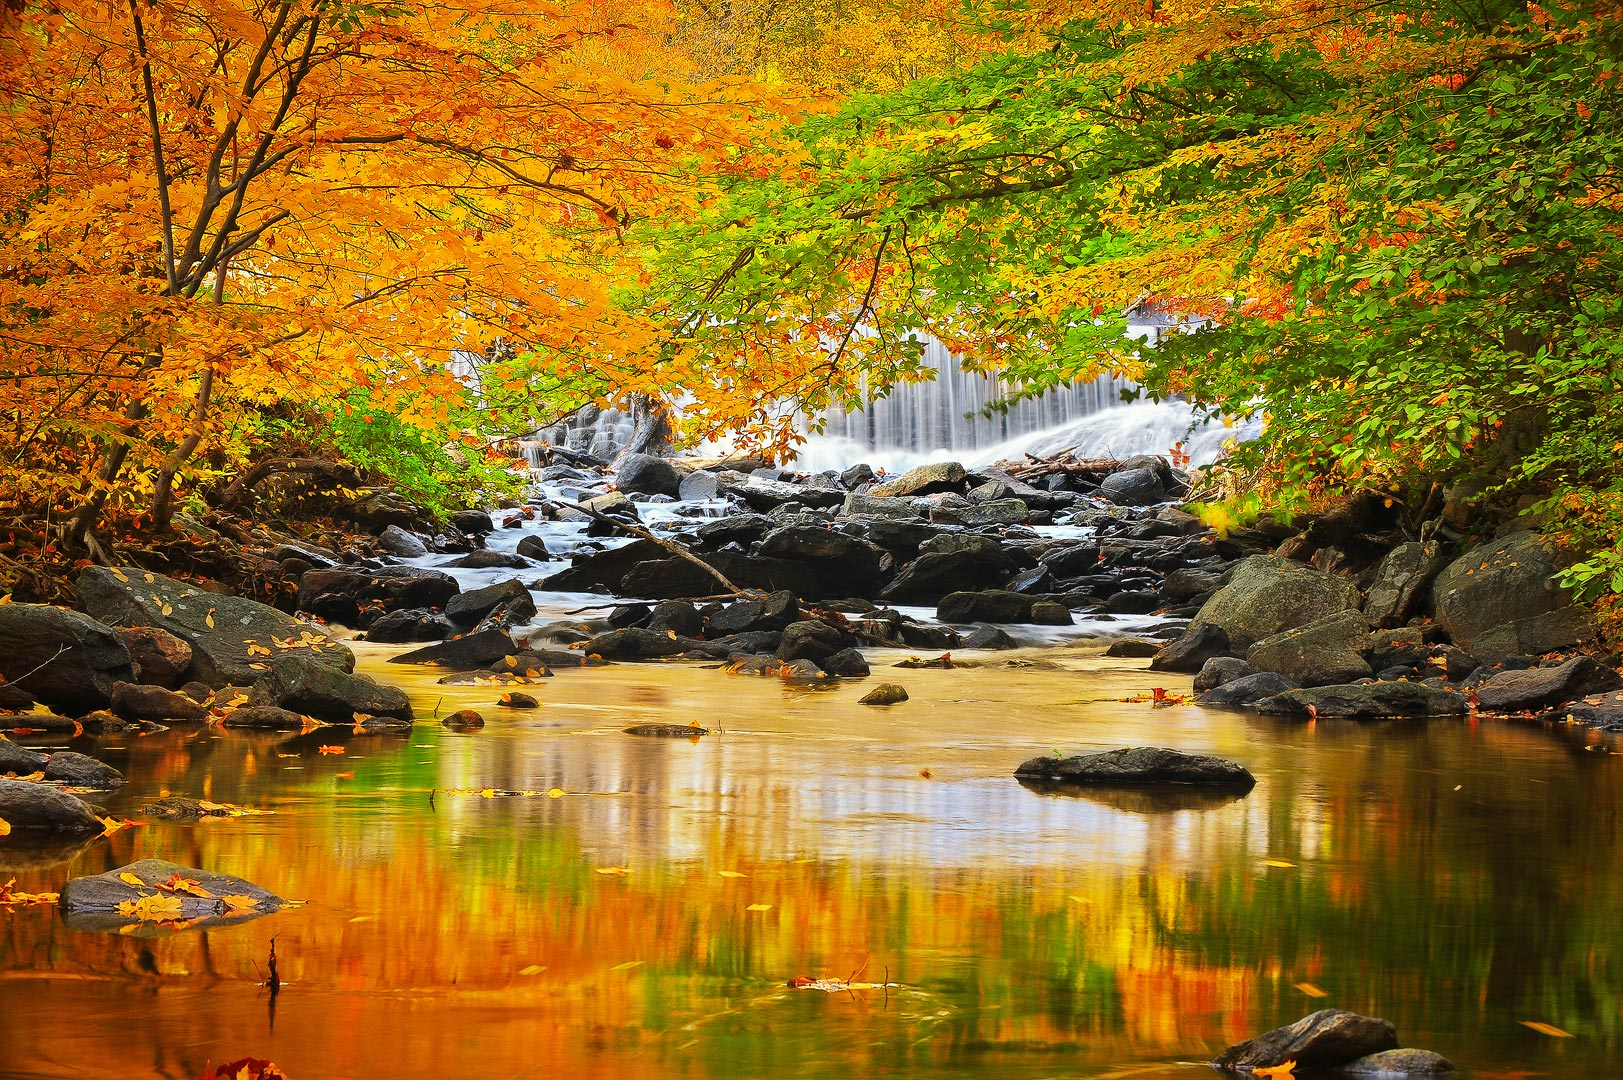 Fall Foliage Wallpaper Screensavers A Season Of Change Catoctin Mountain Maryland Bernard